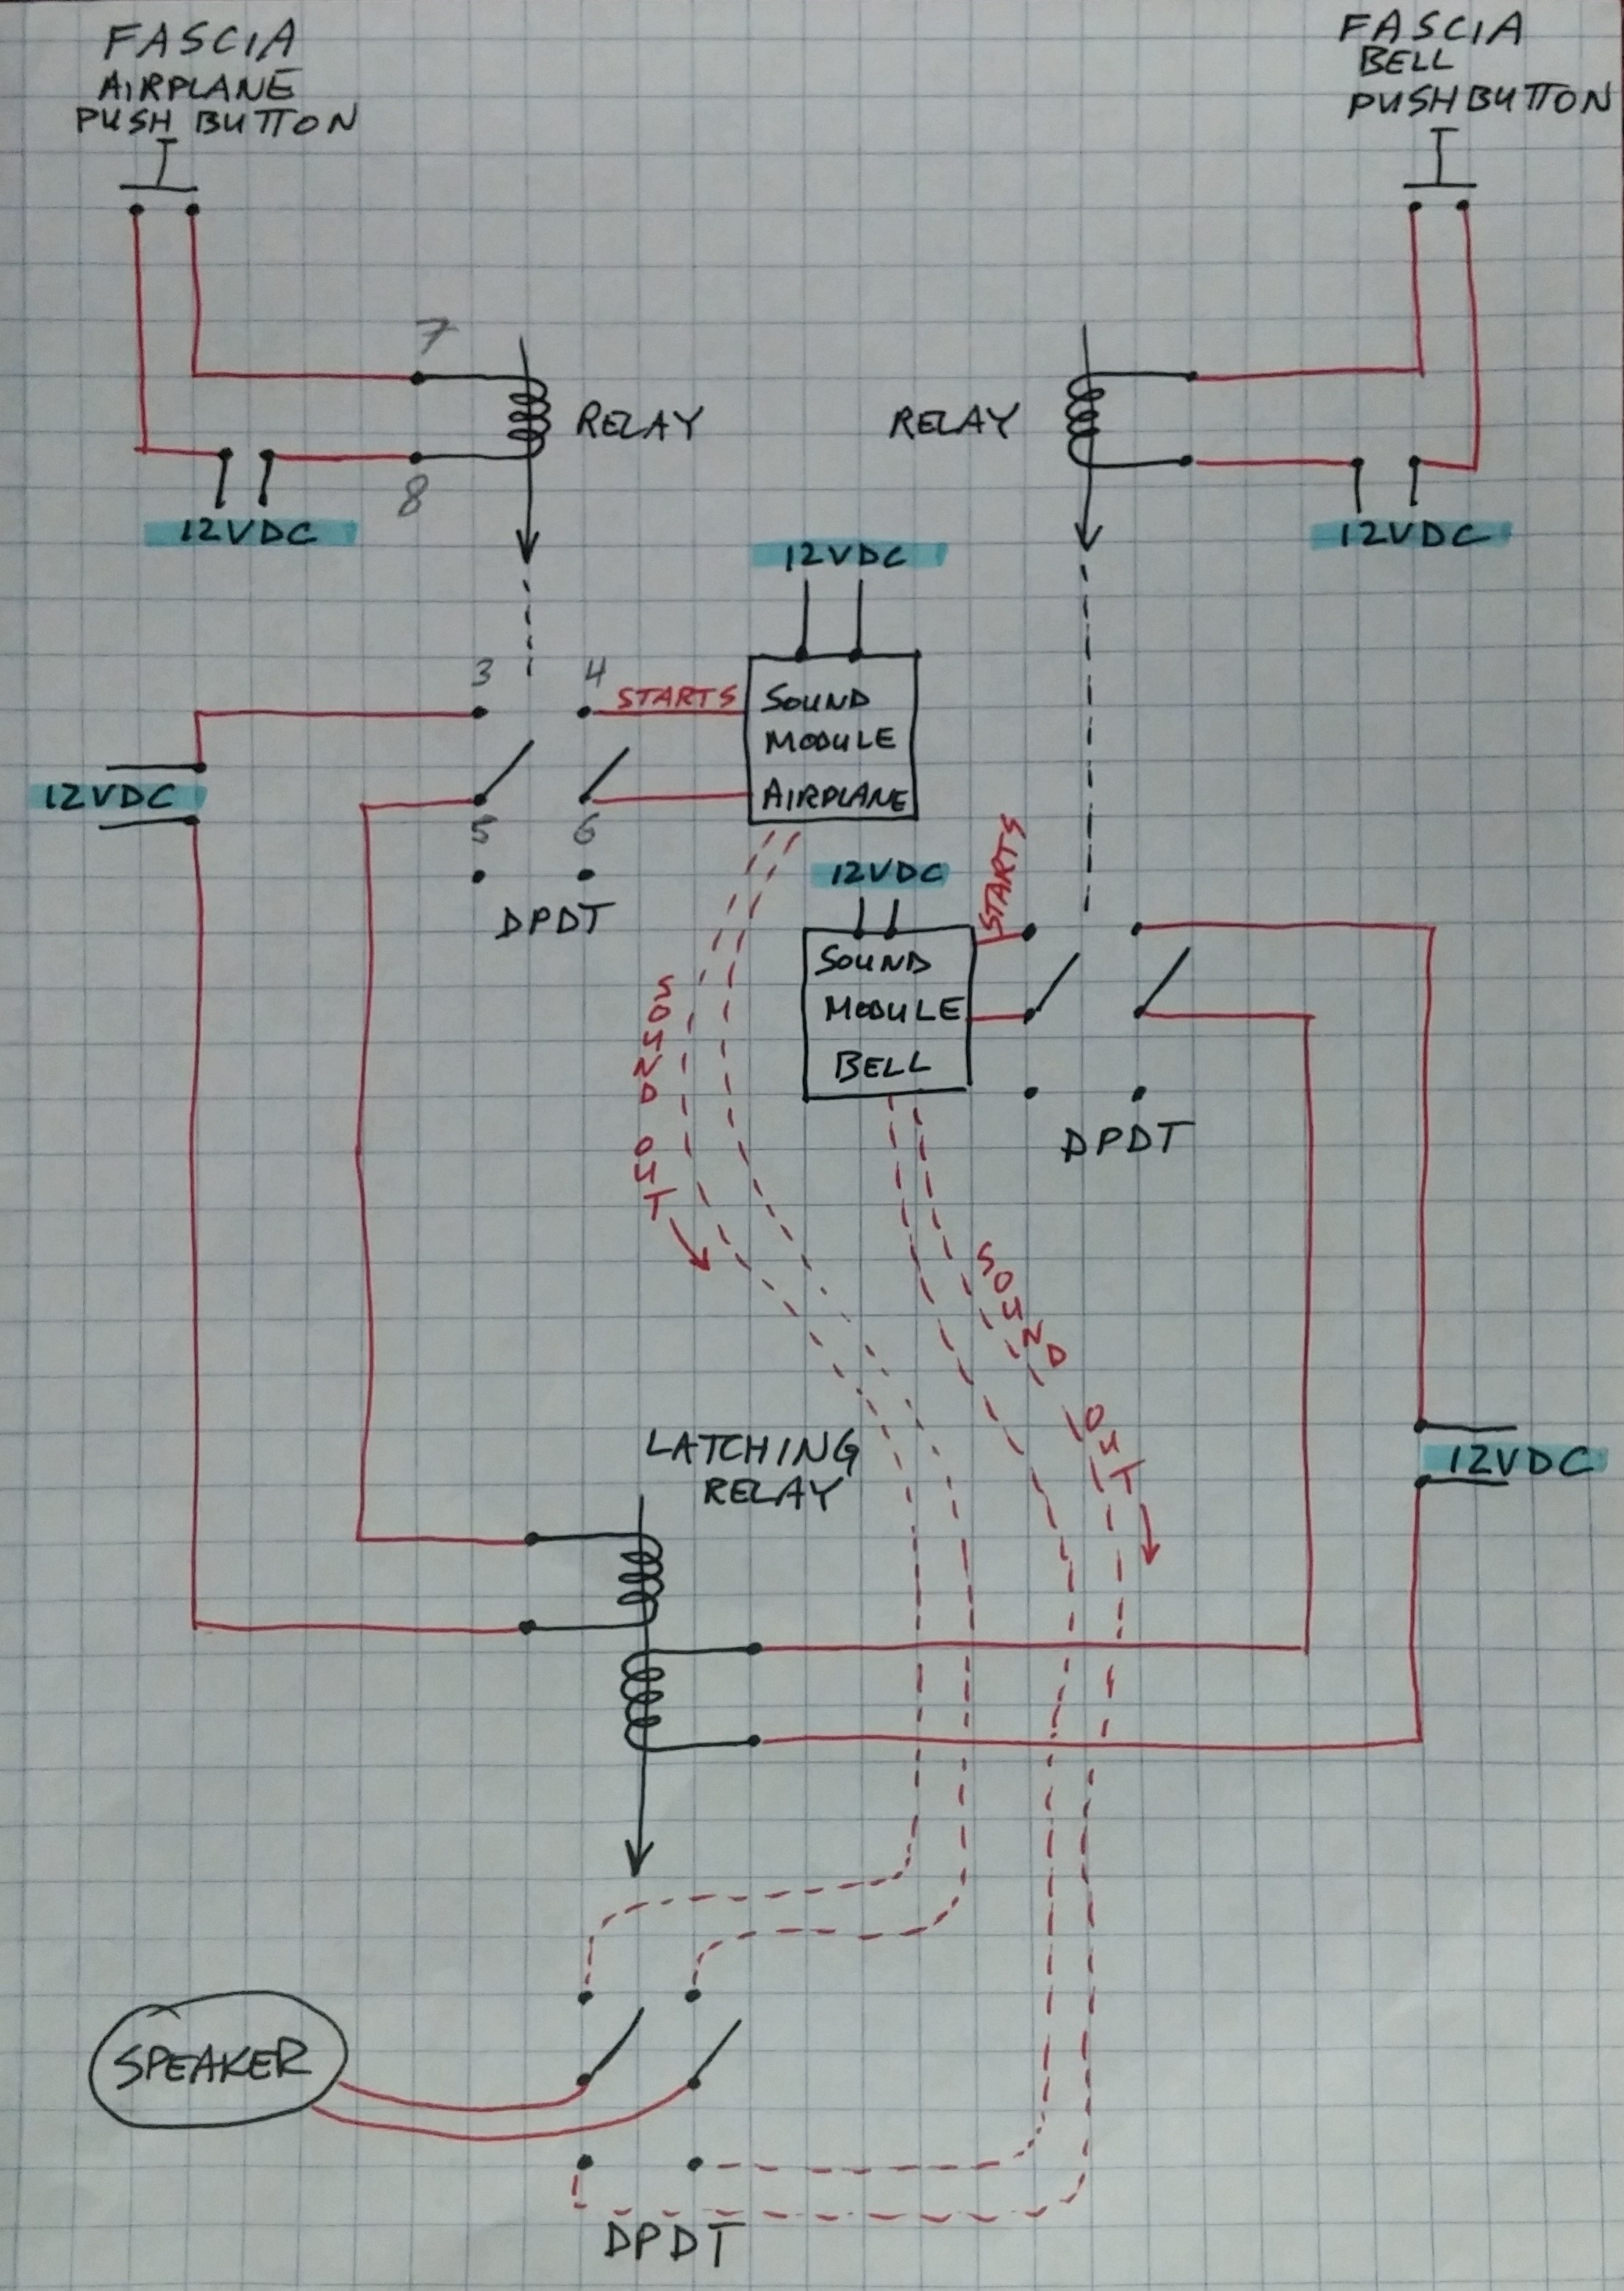 [DIAGRAM_5LK]  BC_7717] New Holland Ls180 Wiring Diagram Free Diagram | L175 Wiring Diagram |  | Xero Ixtu Hyedi Mohammedshrine Librar Wiring 101